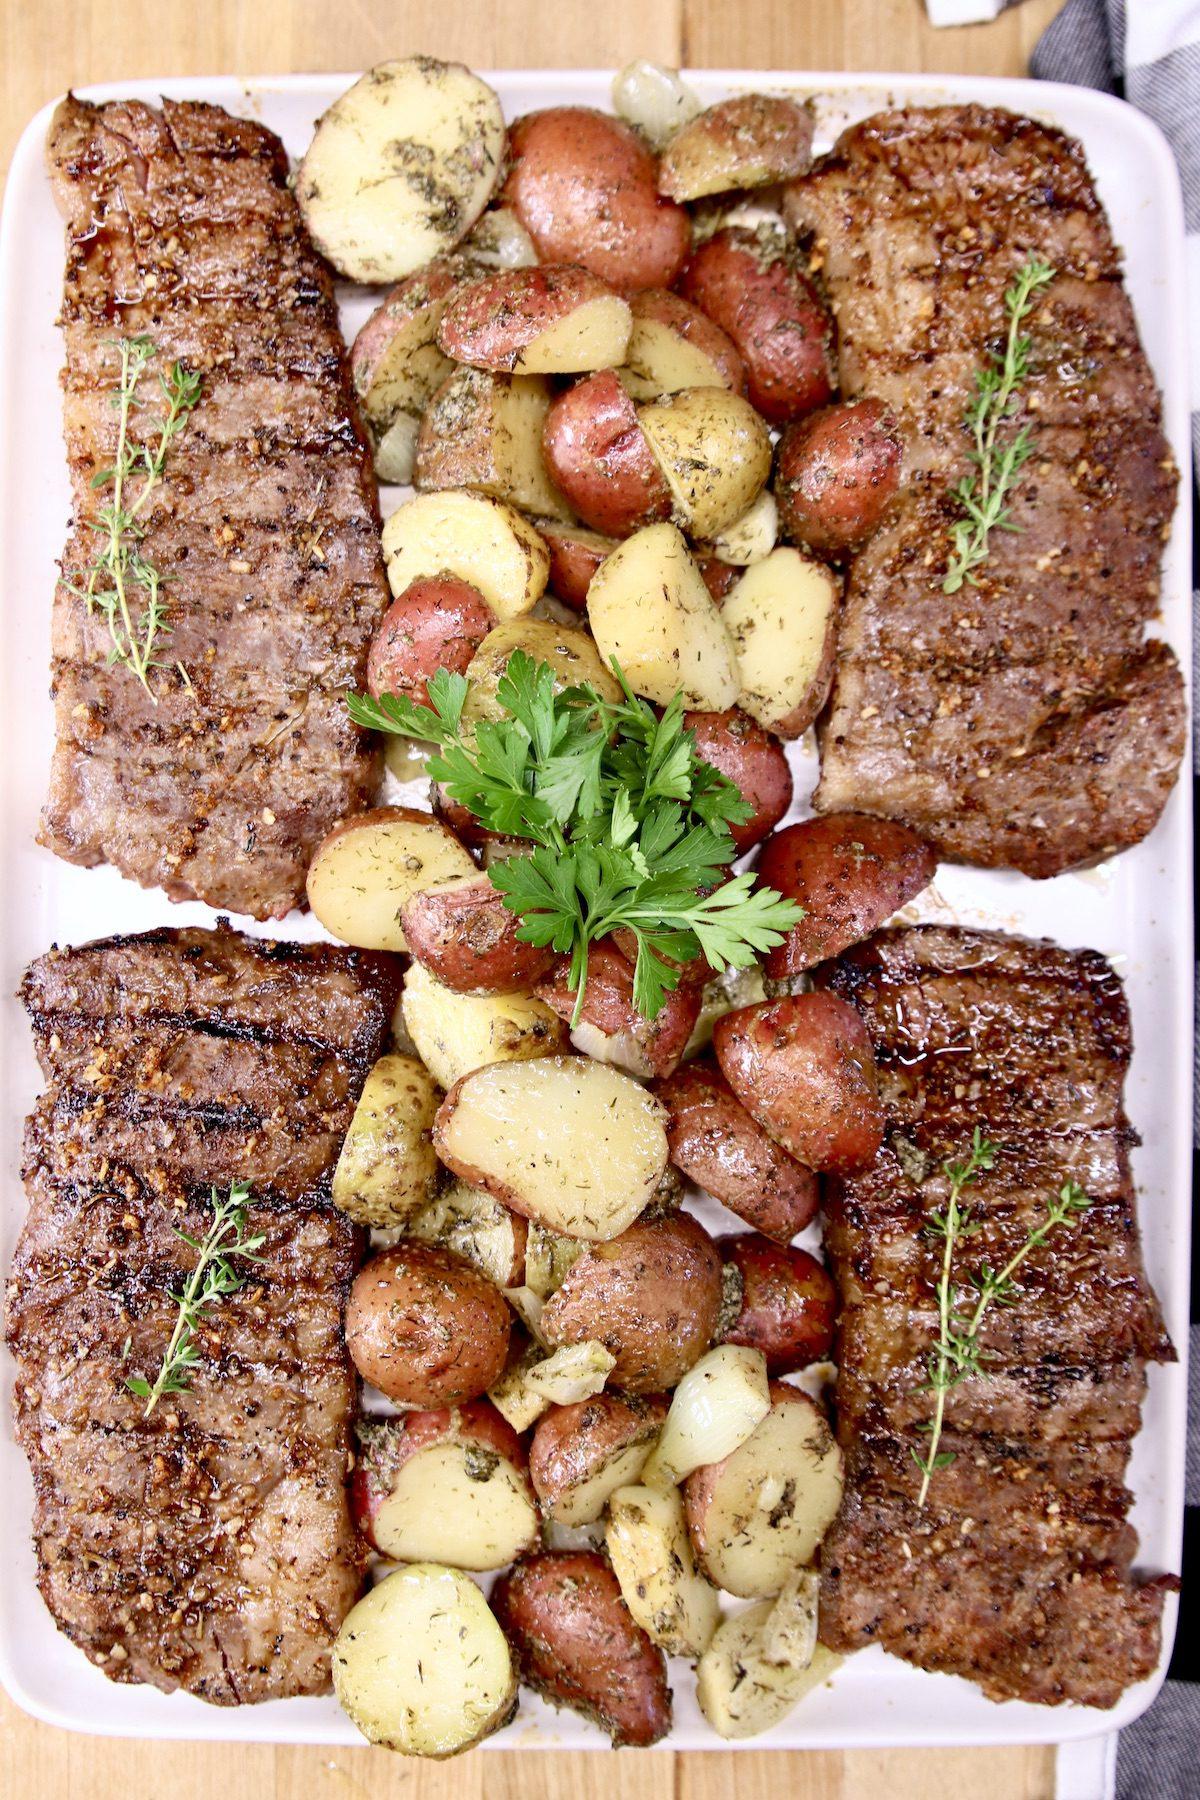 Steak & potatoes on a tray